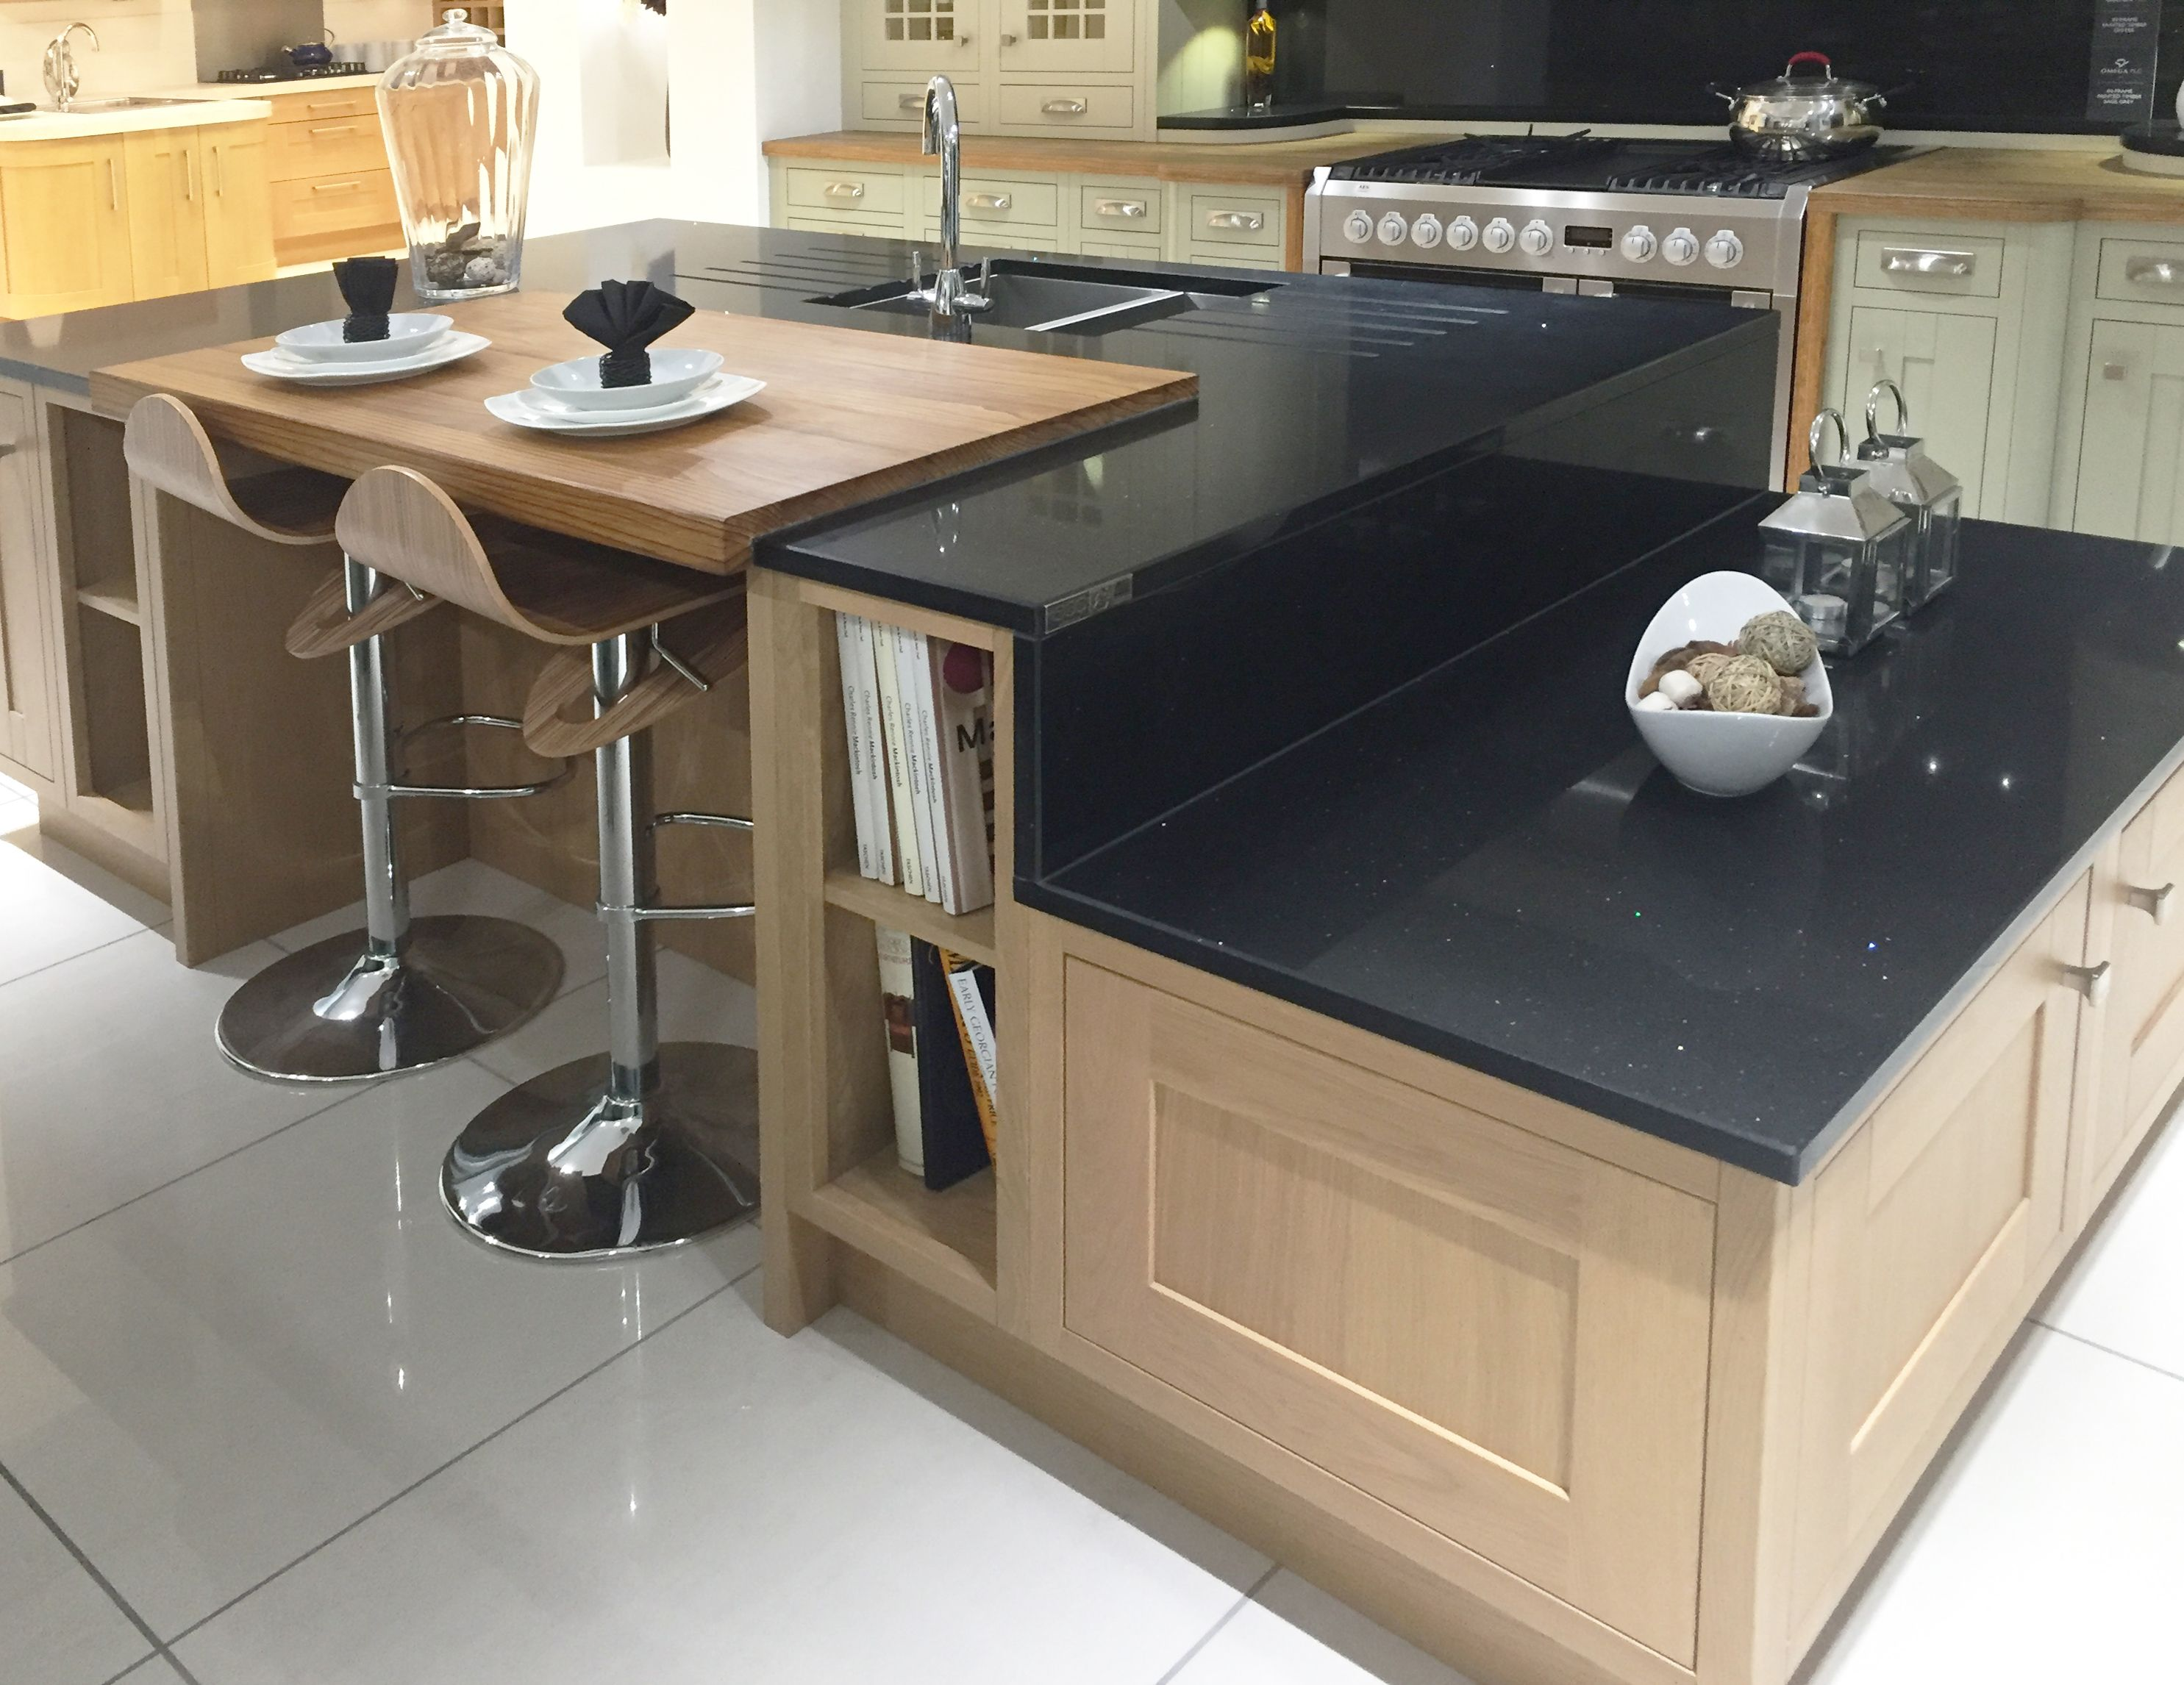 Contemporary Kitchen Island Design In Lissa Oak With